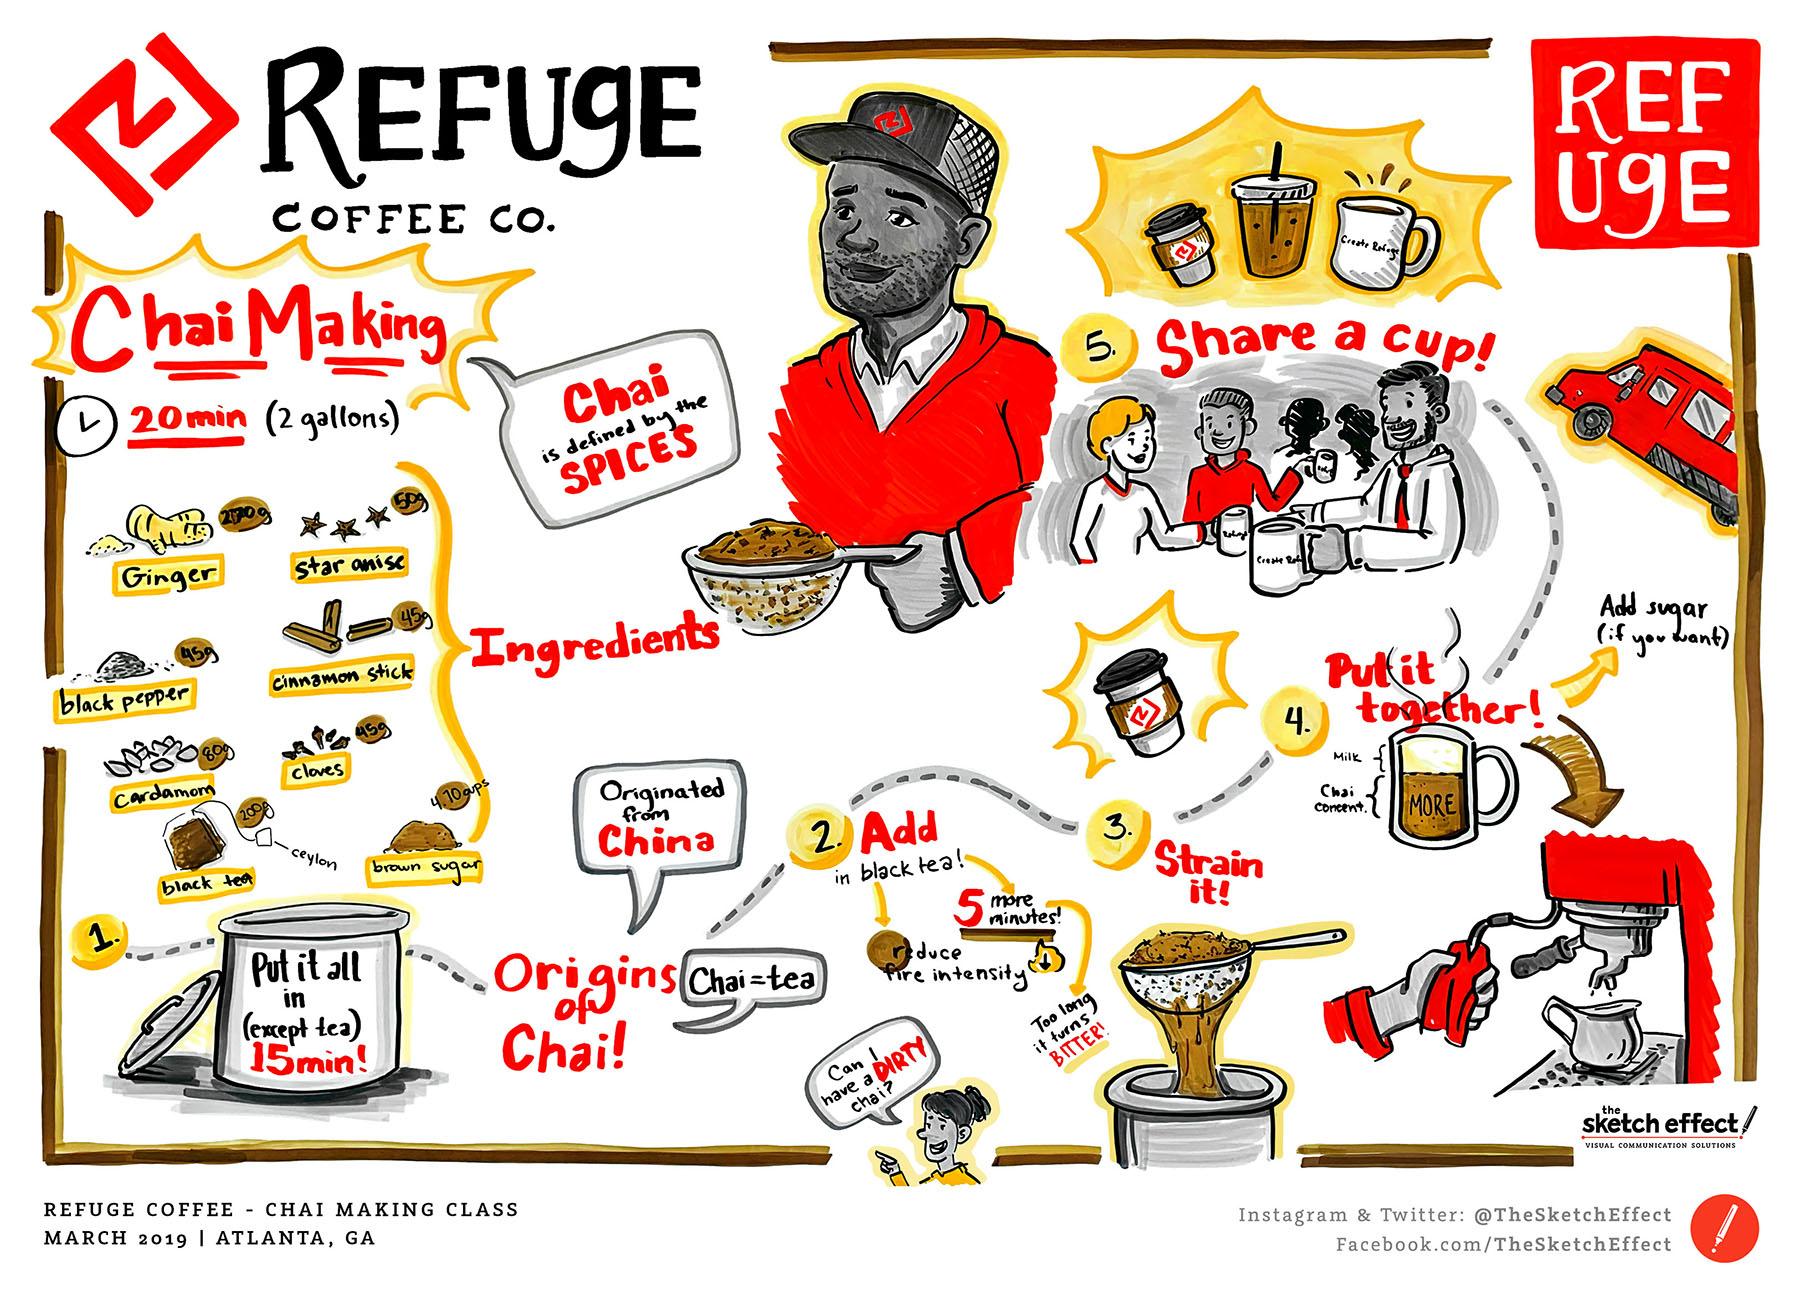 TSE_RefugeCoffee_B01(small)